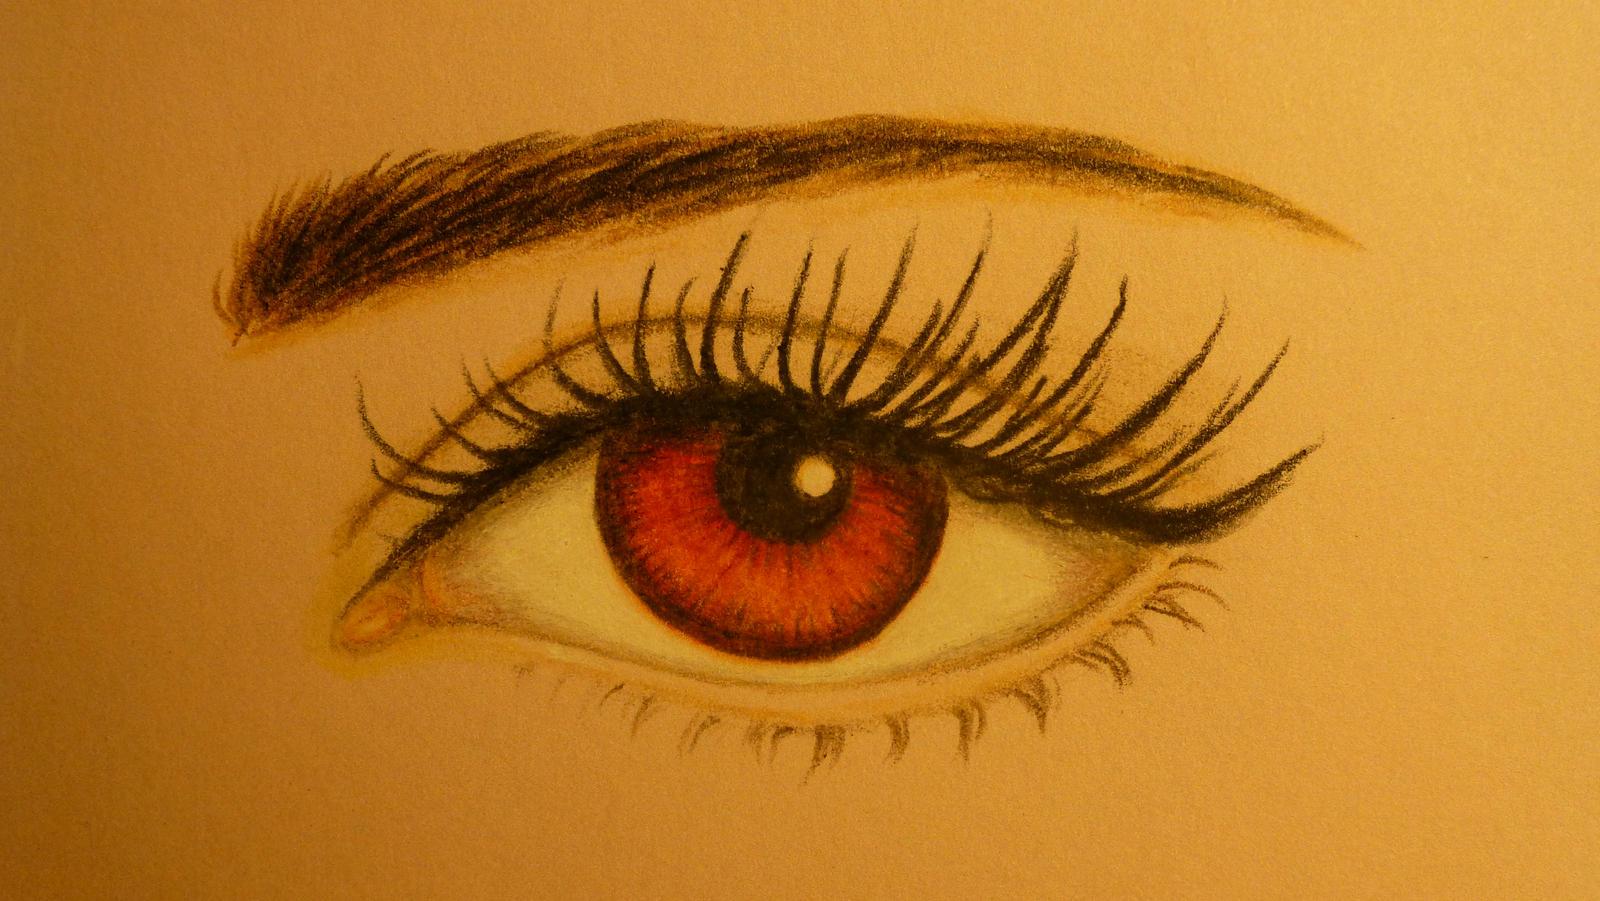 Bella swan eye drawing by jenniferefinn on deviantart for Tumblr drawings of eyes